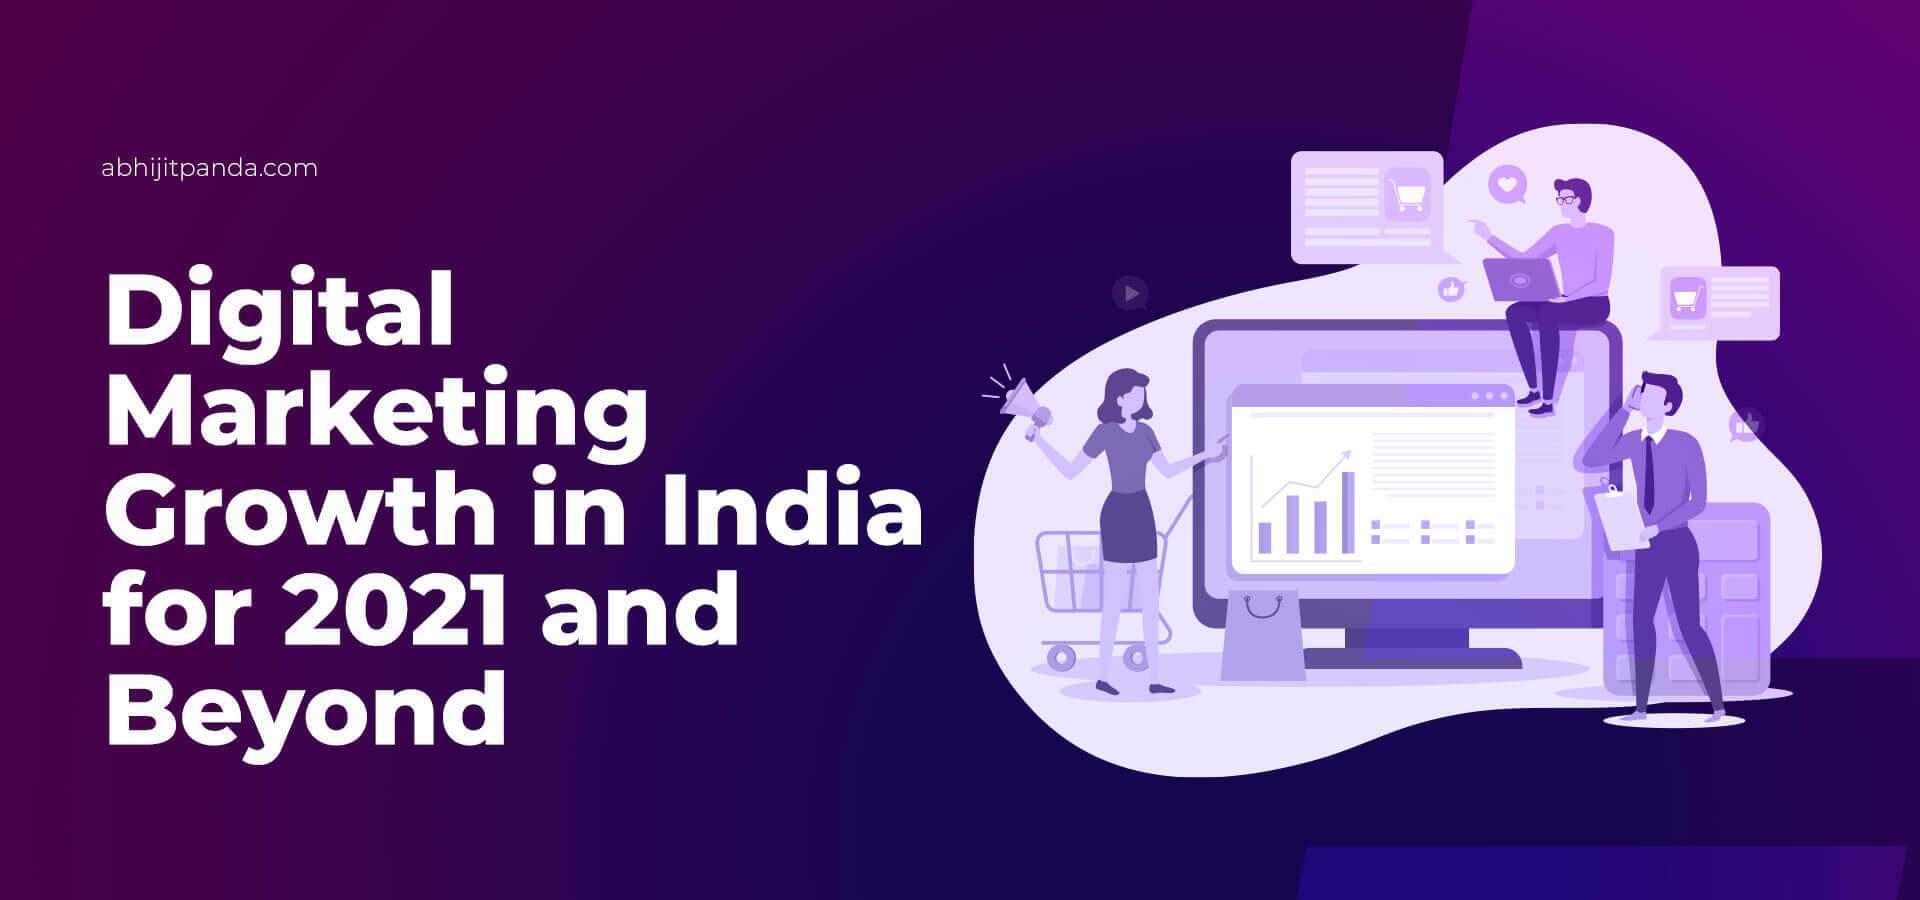 Digital Marketing Growth in India